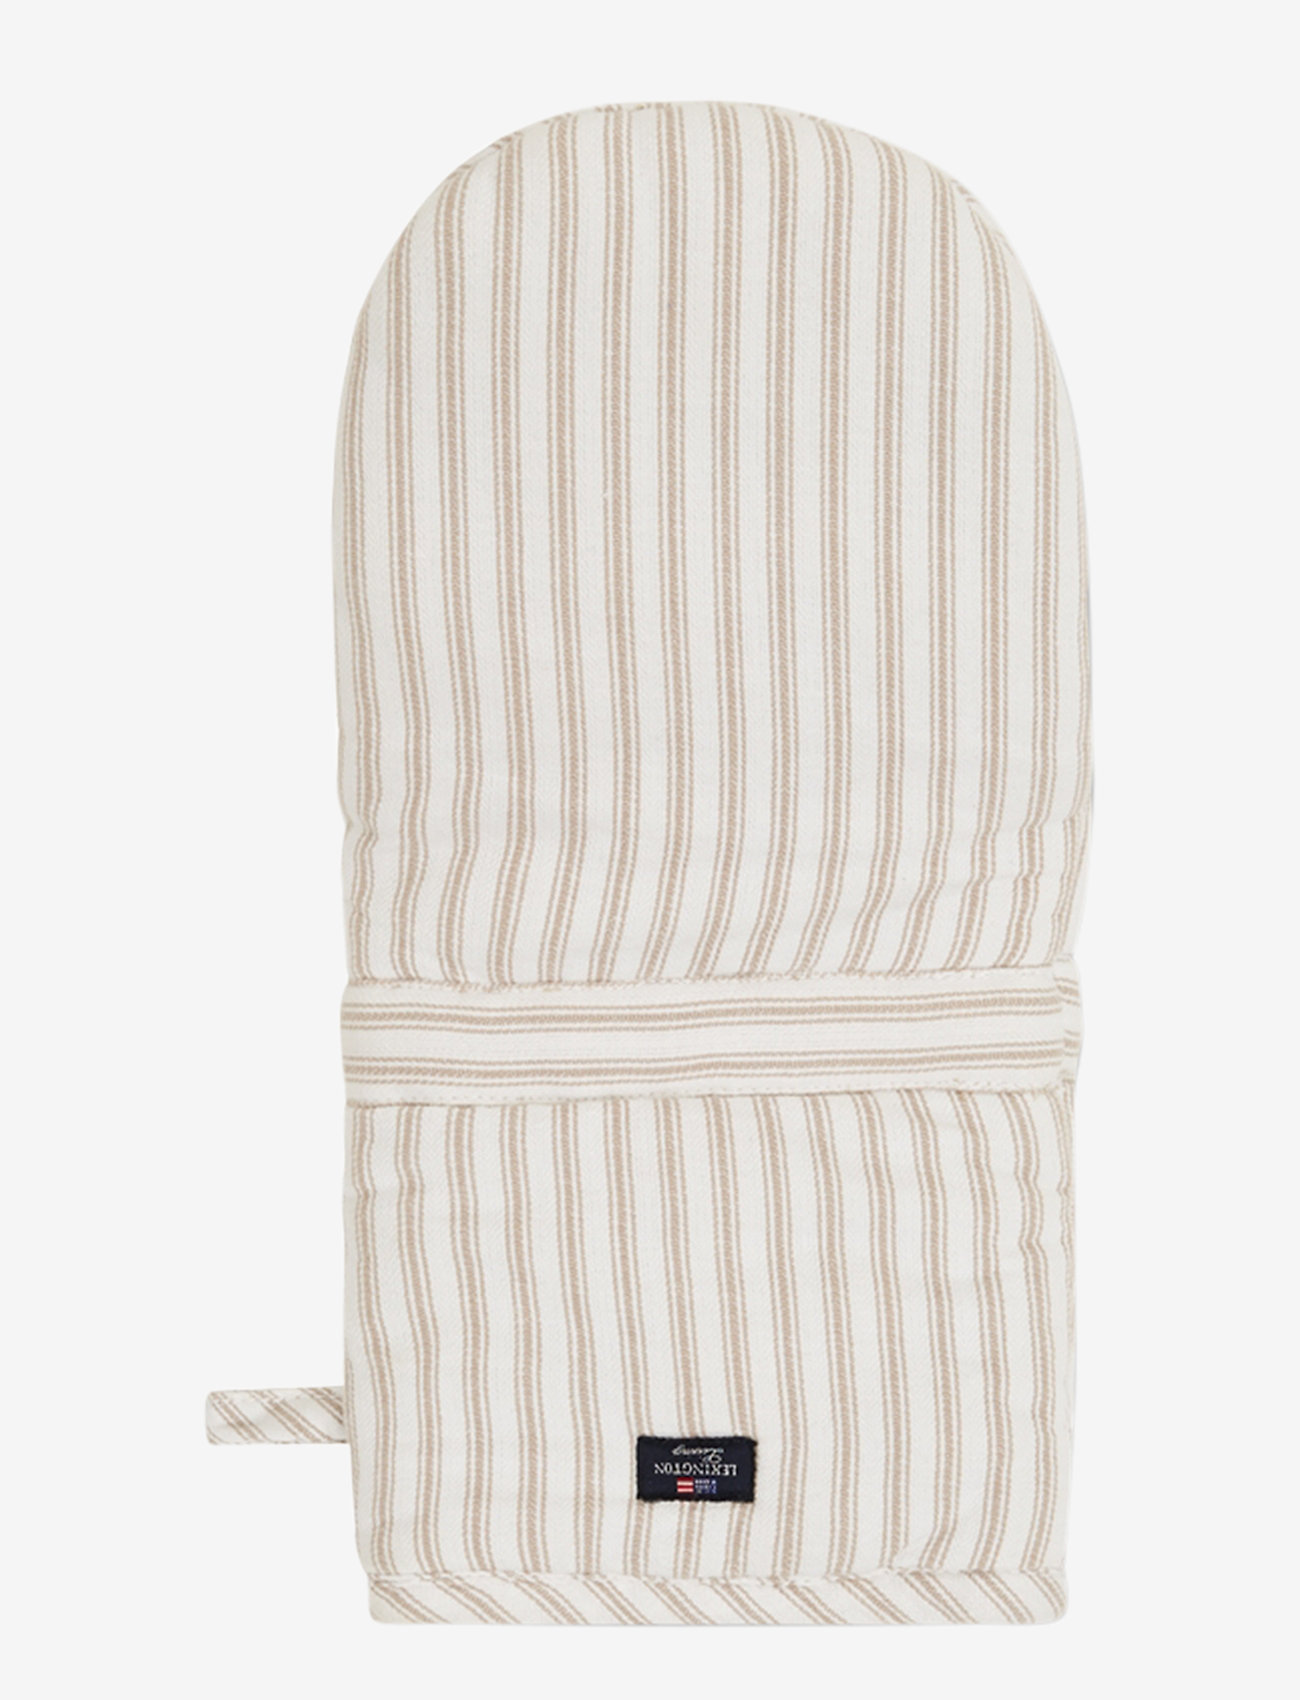 Lexington Home - Icons Cotton Herringbone Striped Mitten - pannulaput ja patakintaat - beige/white - 0